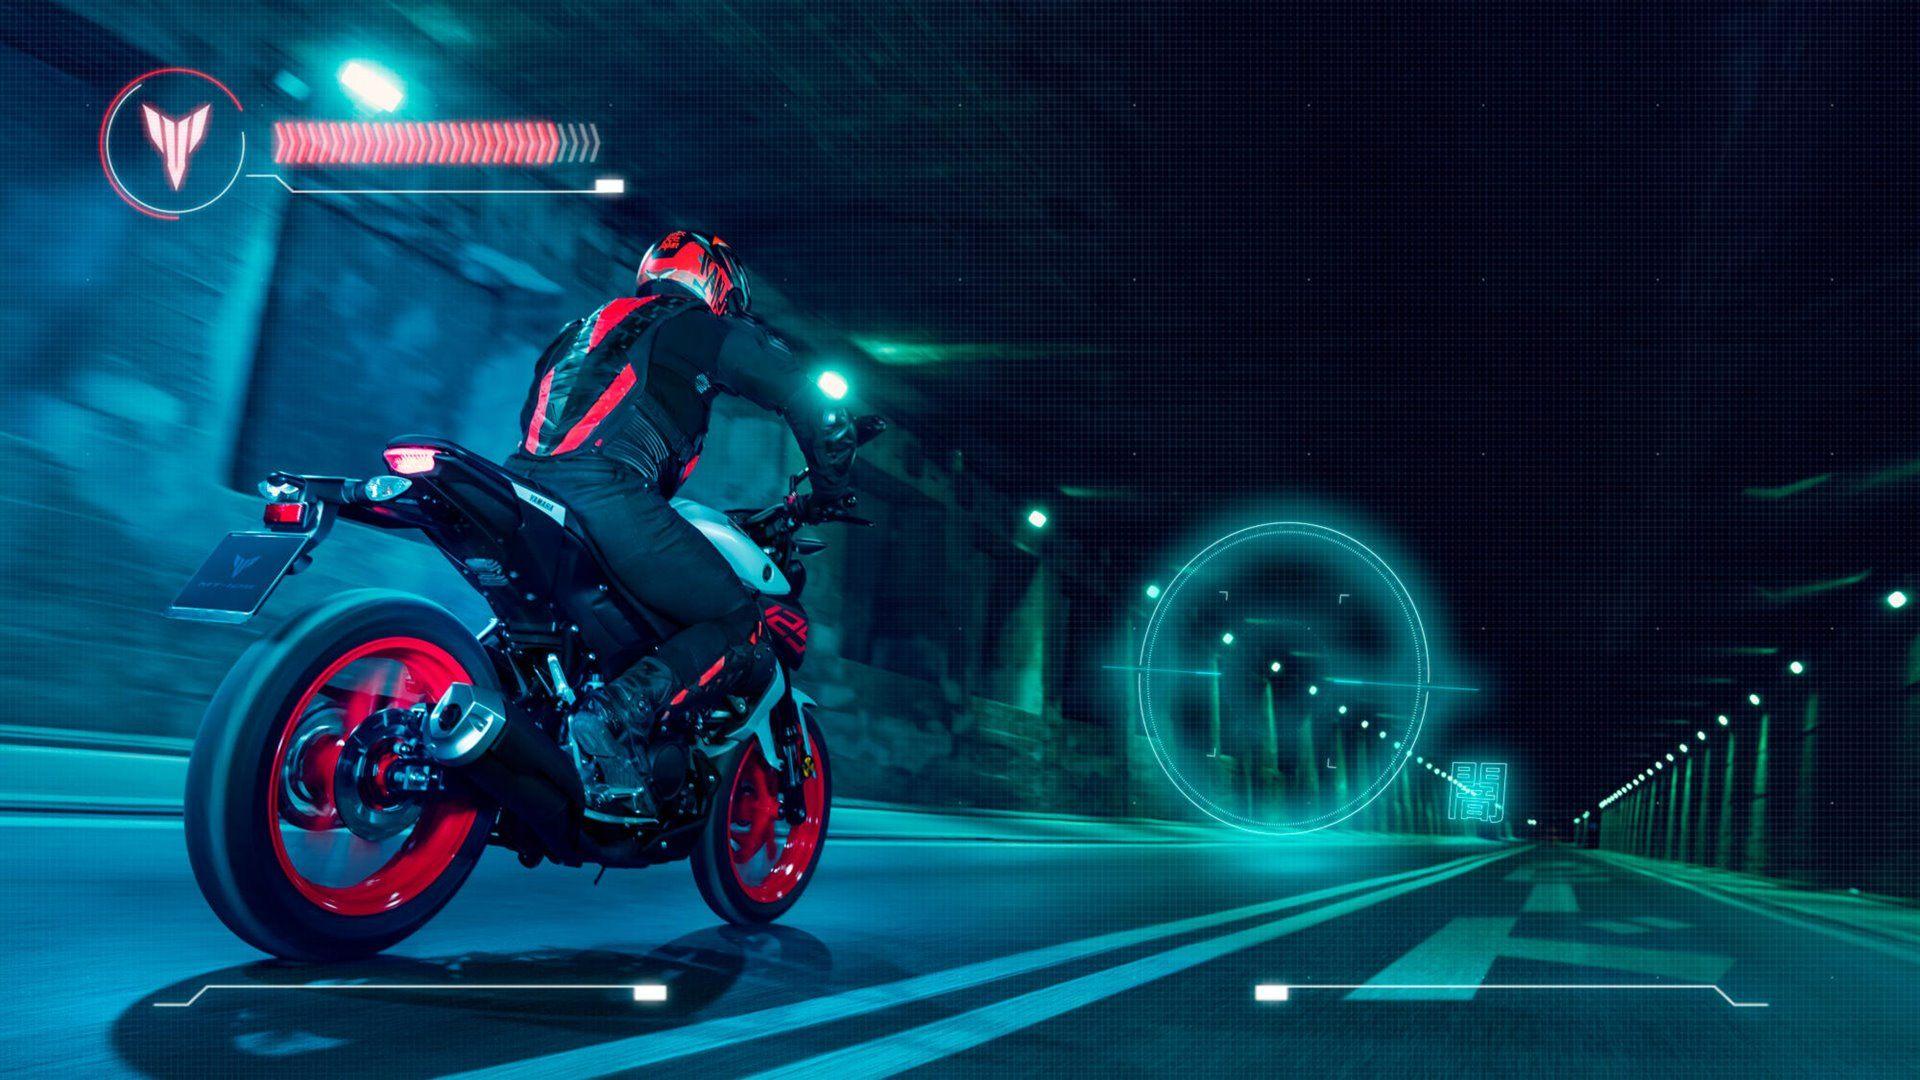 2020 Yamaha MT125 EU Ice Fluo Action 003 03